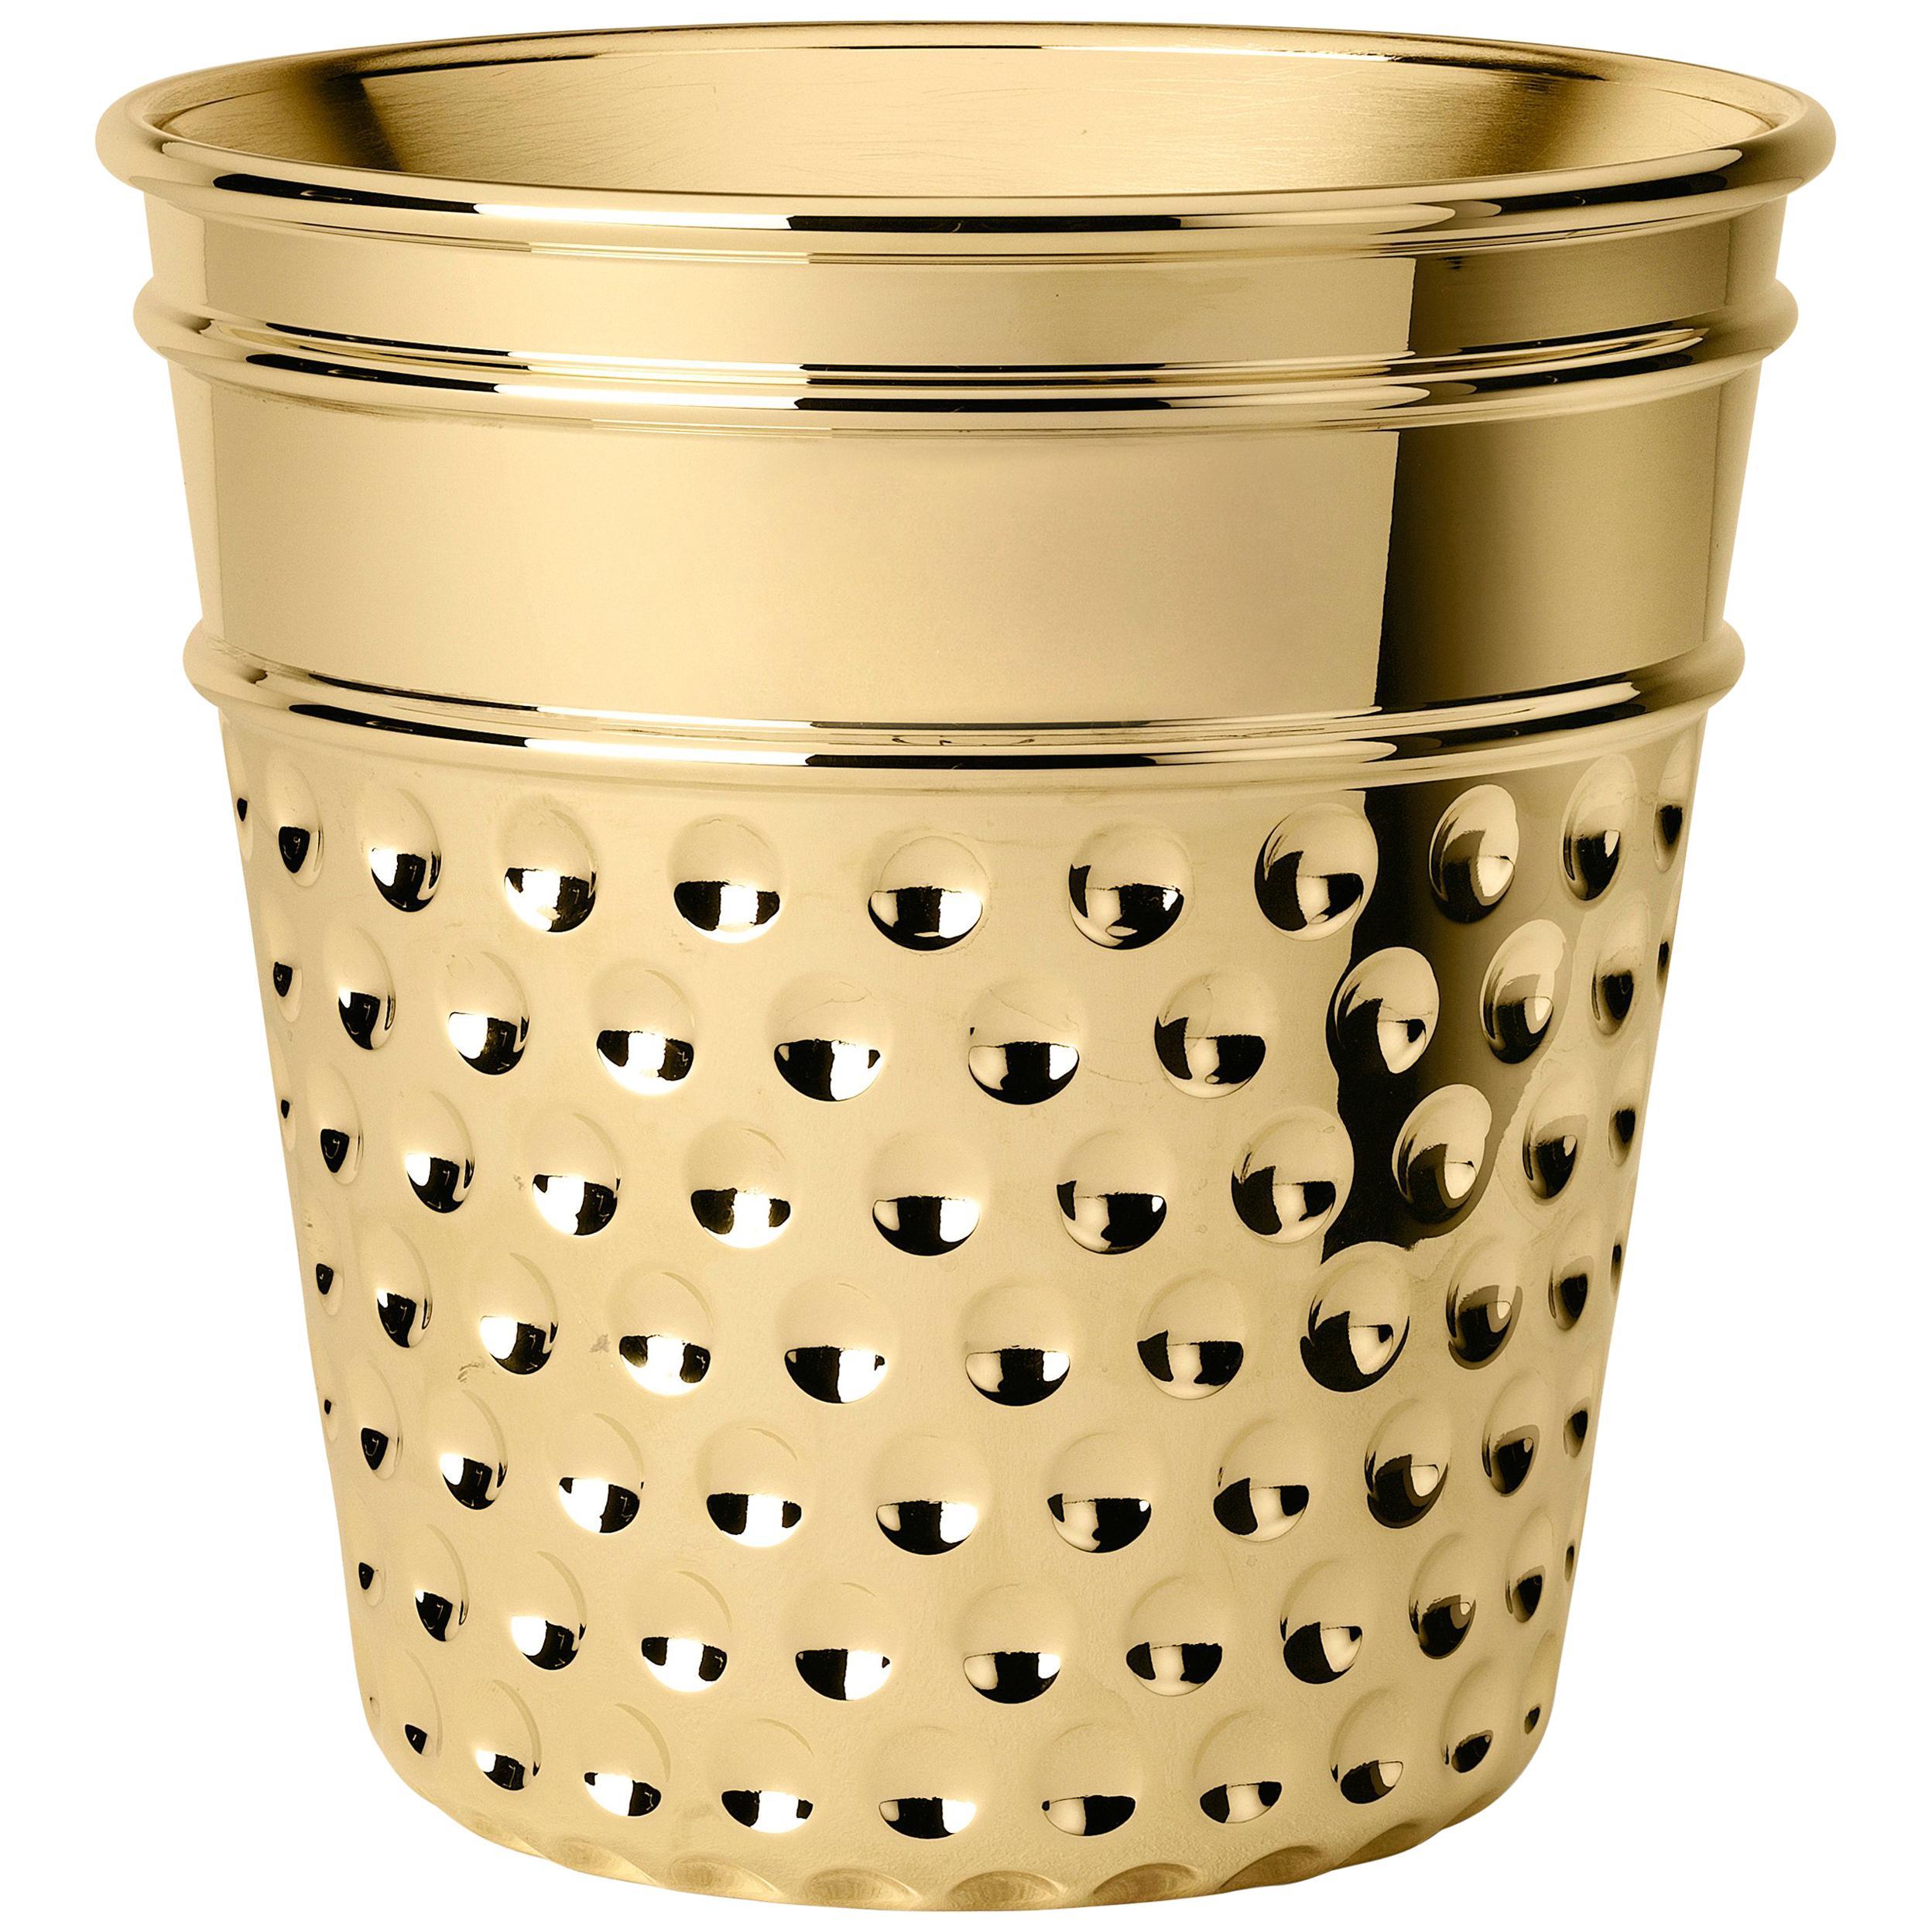 Ghidini 1961 Thimble Ice Bucket in Brass by Studio Job